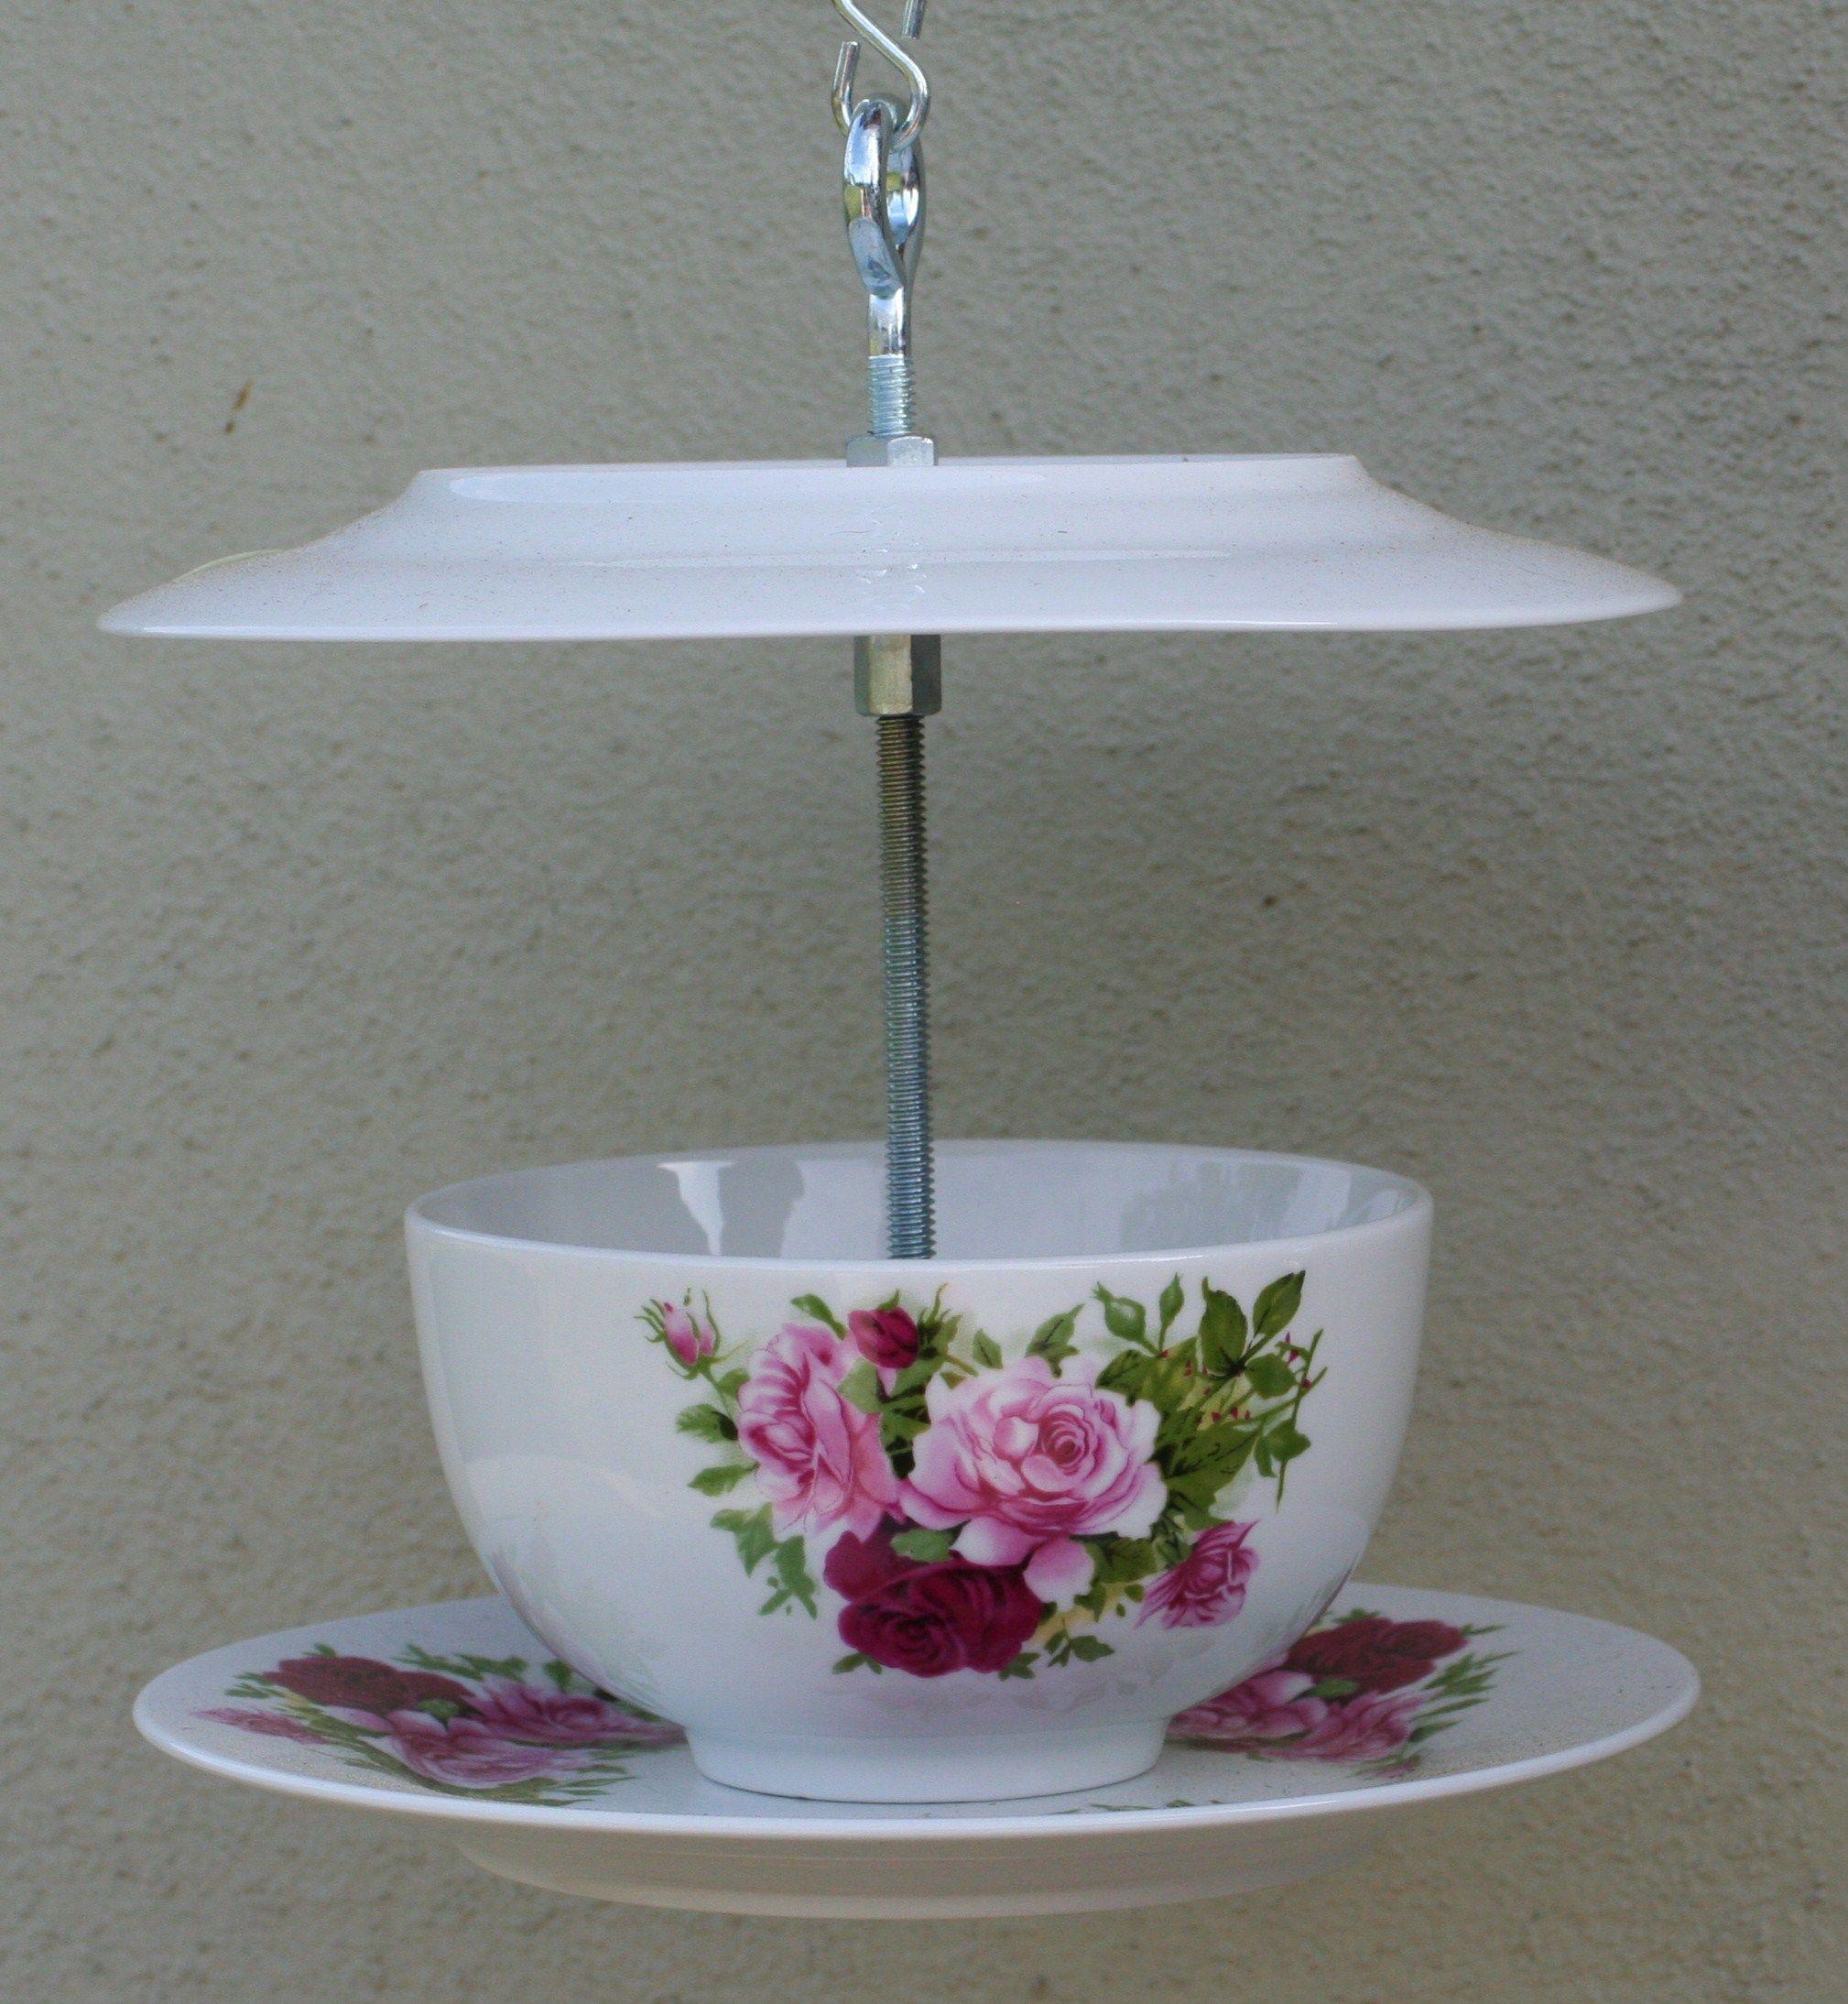 Birdfeeder; Another tea set.